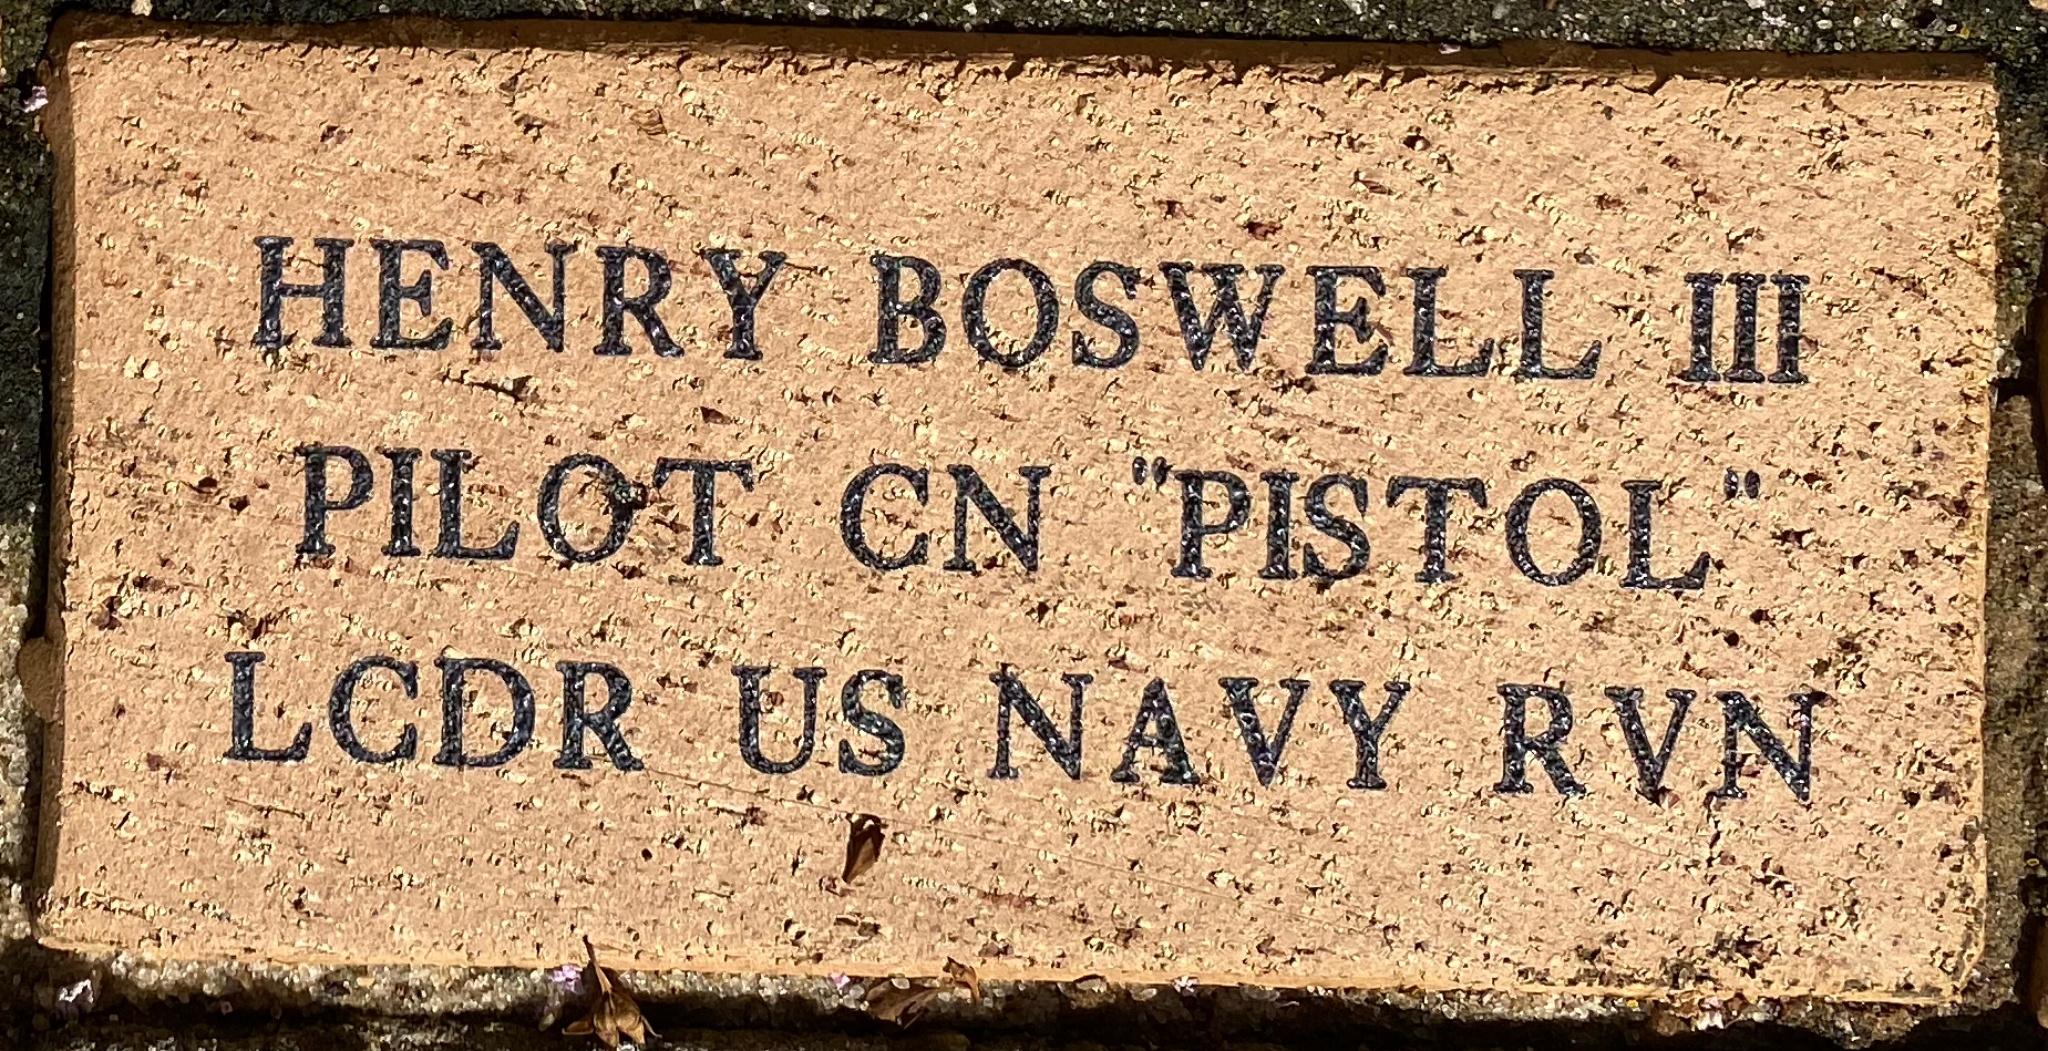 "HENRY BOSWELL III PILOT CN ""PISTOL"" LCDR US NAVY RVN"